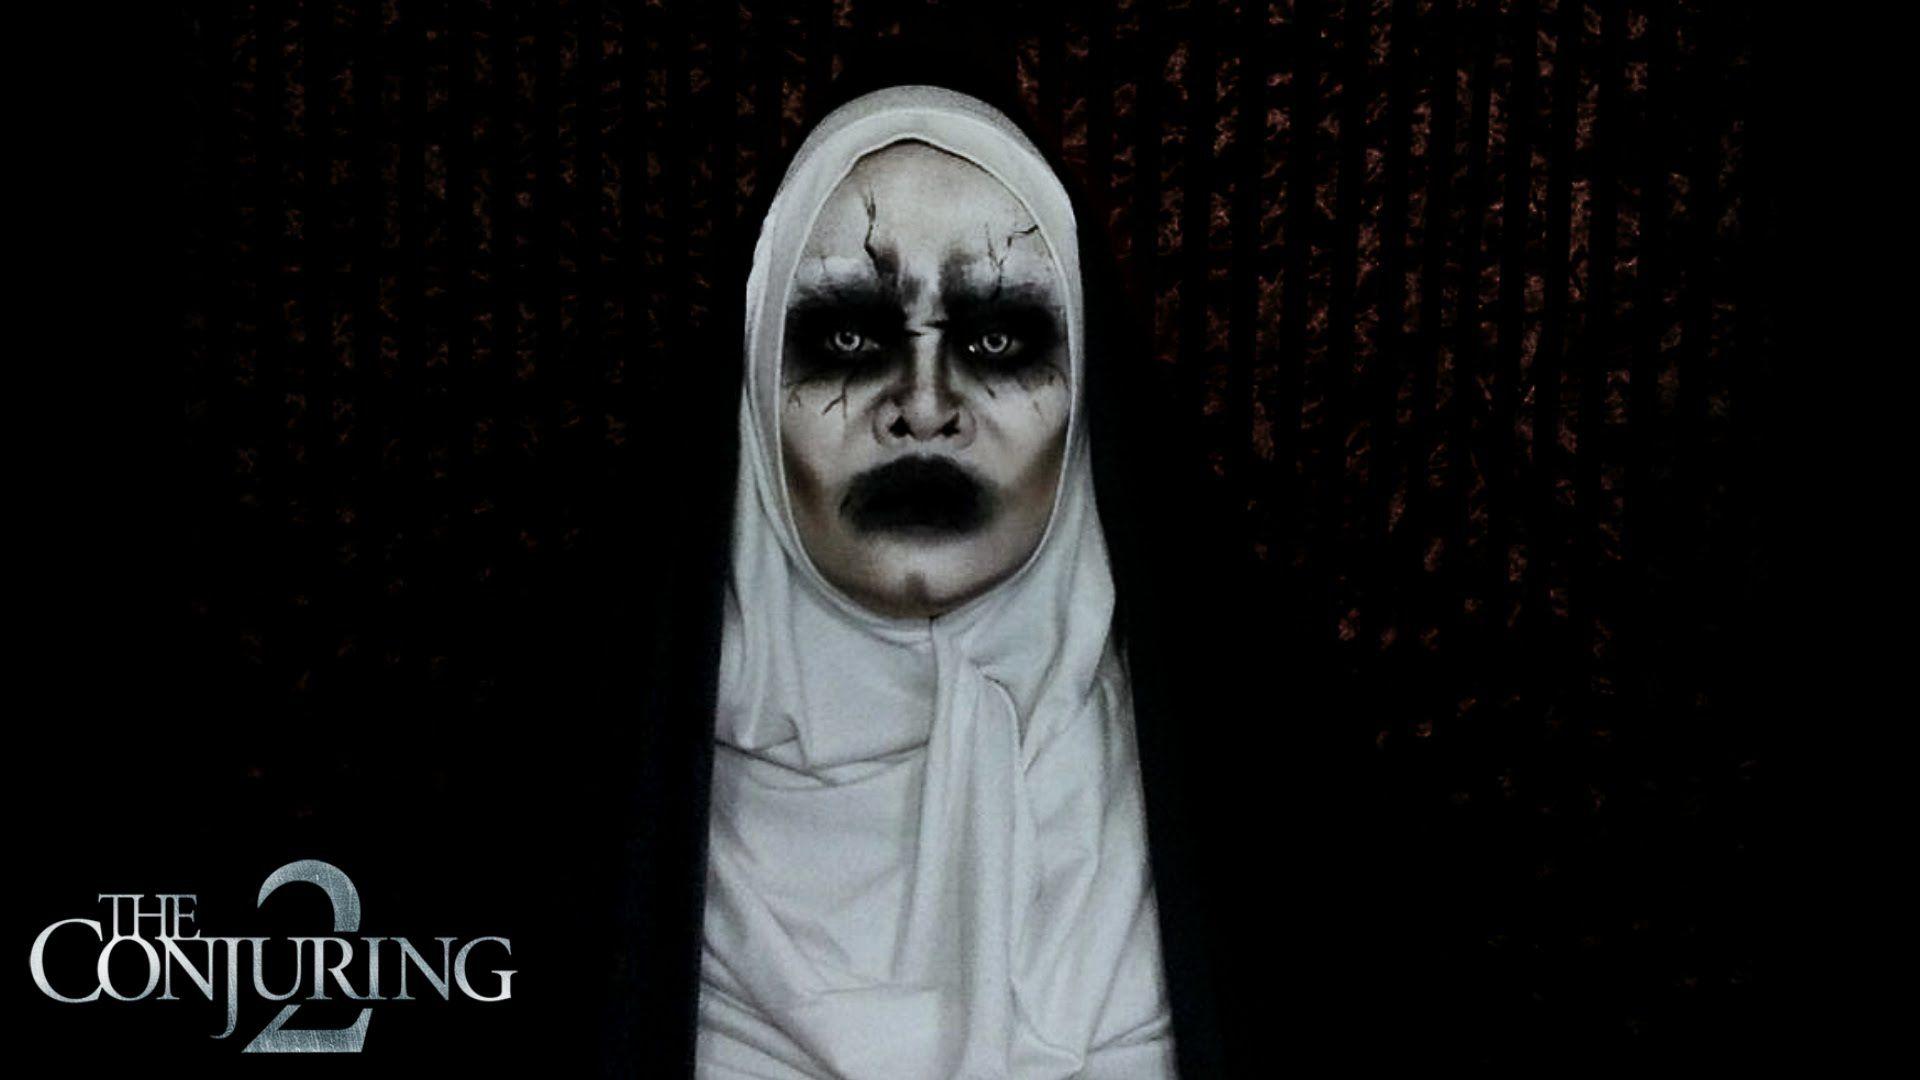 The Conjuring Horror Pinterest Horror Movie And Scary Movies The Conjuring Horror Movies Movie Wallpapers